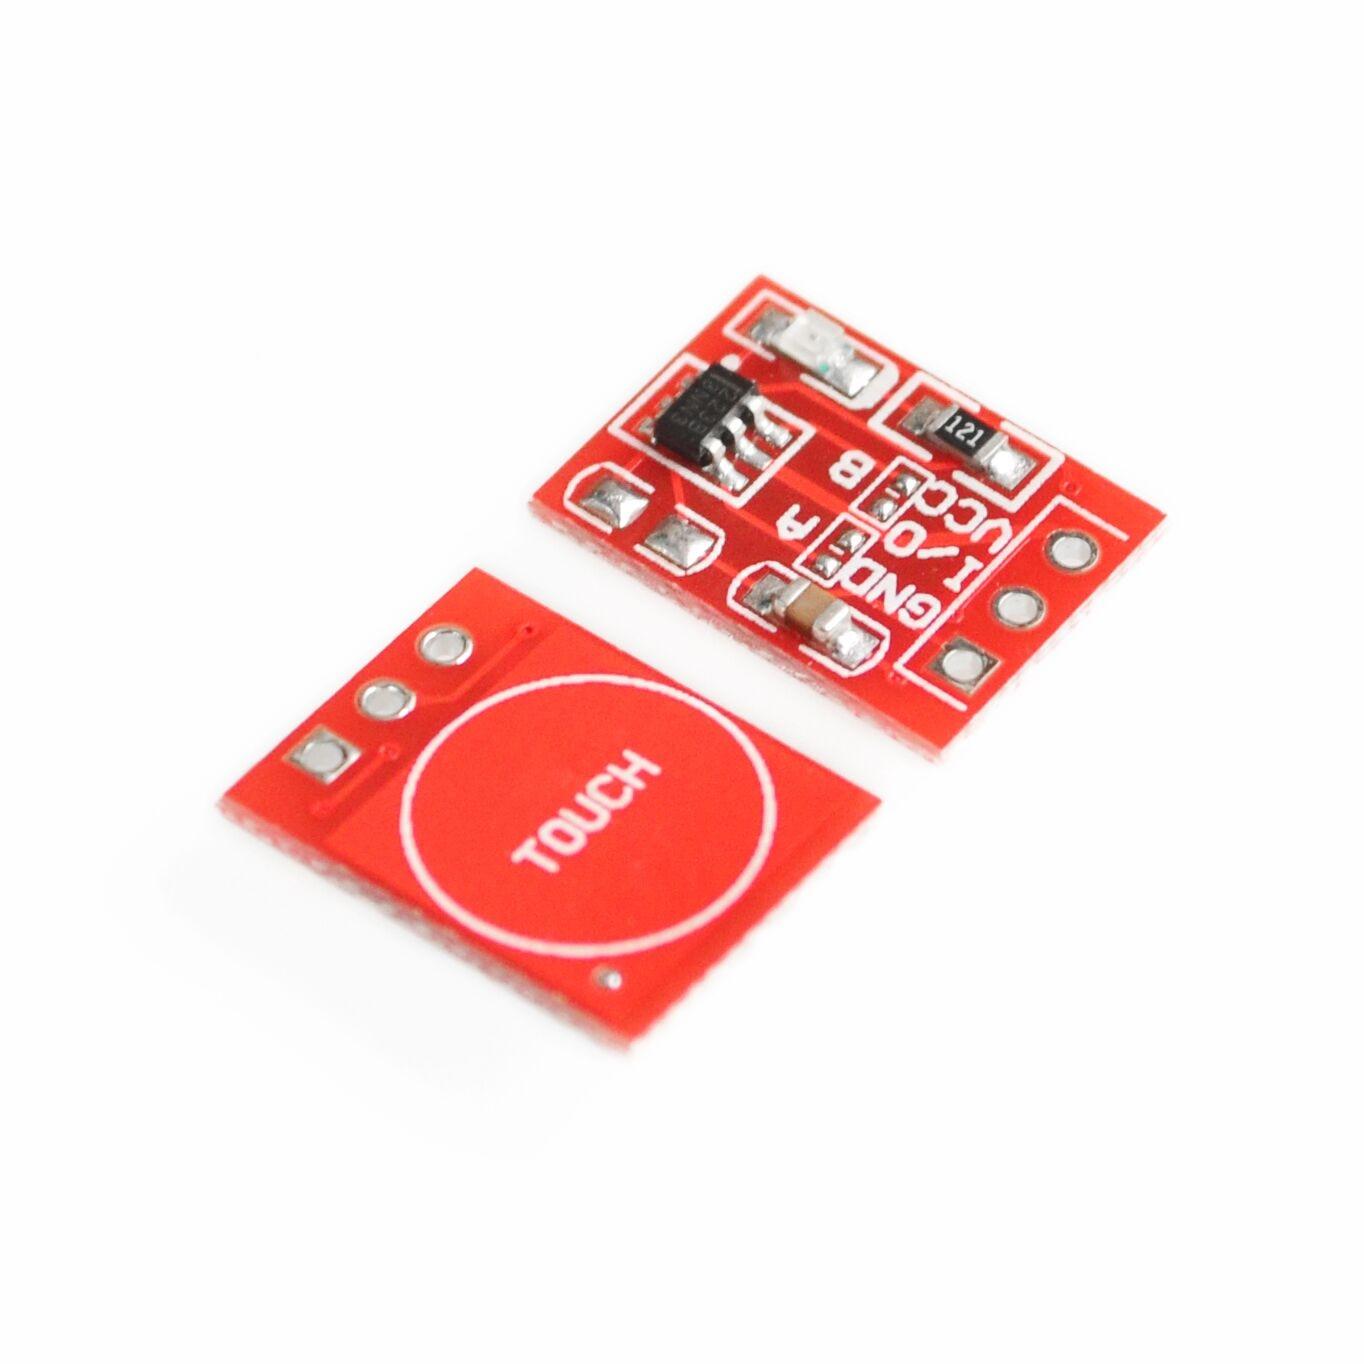 10 unids/lote nueva TTP223 Módulo de botón táctil Tipo de condensador de canal único auto bloqueo Touch sensor de interruptor de